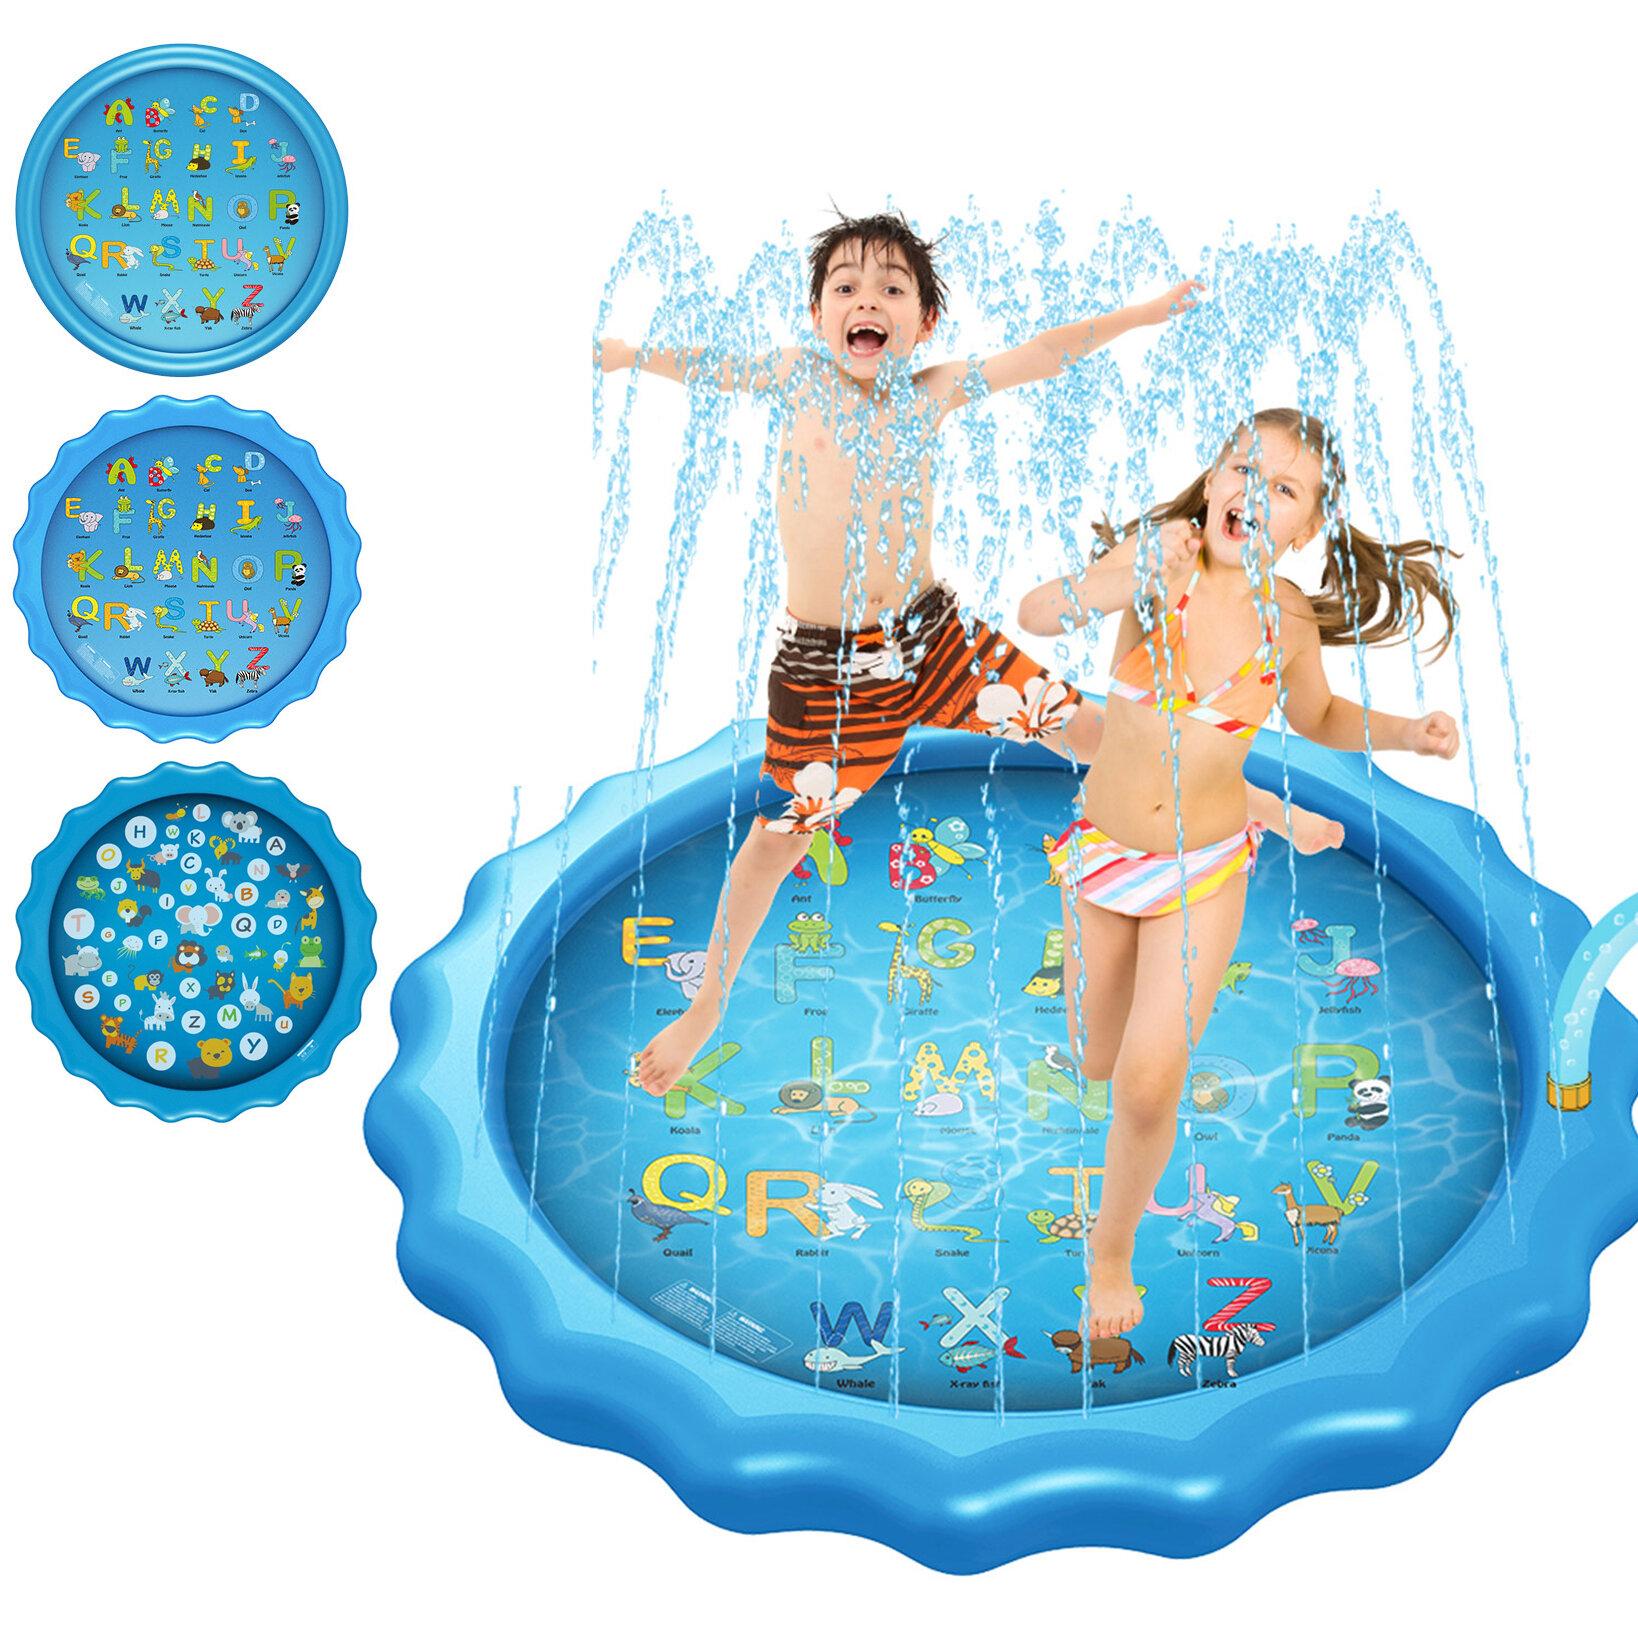 "170CM*10CM/68""*3.93'' Inflatable Swimming Pool Summer Splash Sprinkle Sprinkler Playmat Outdoor Water Play Mat Toy for Kids Children Toddlers"